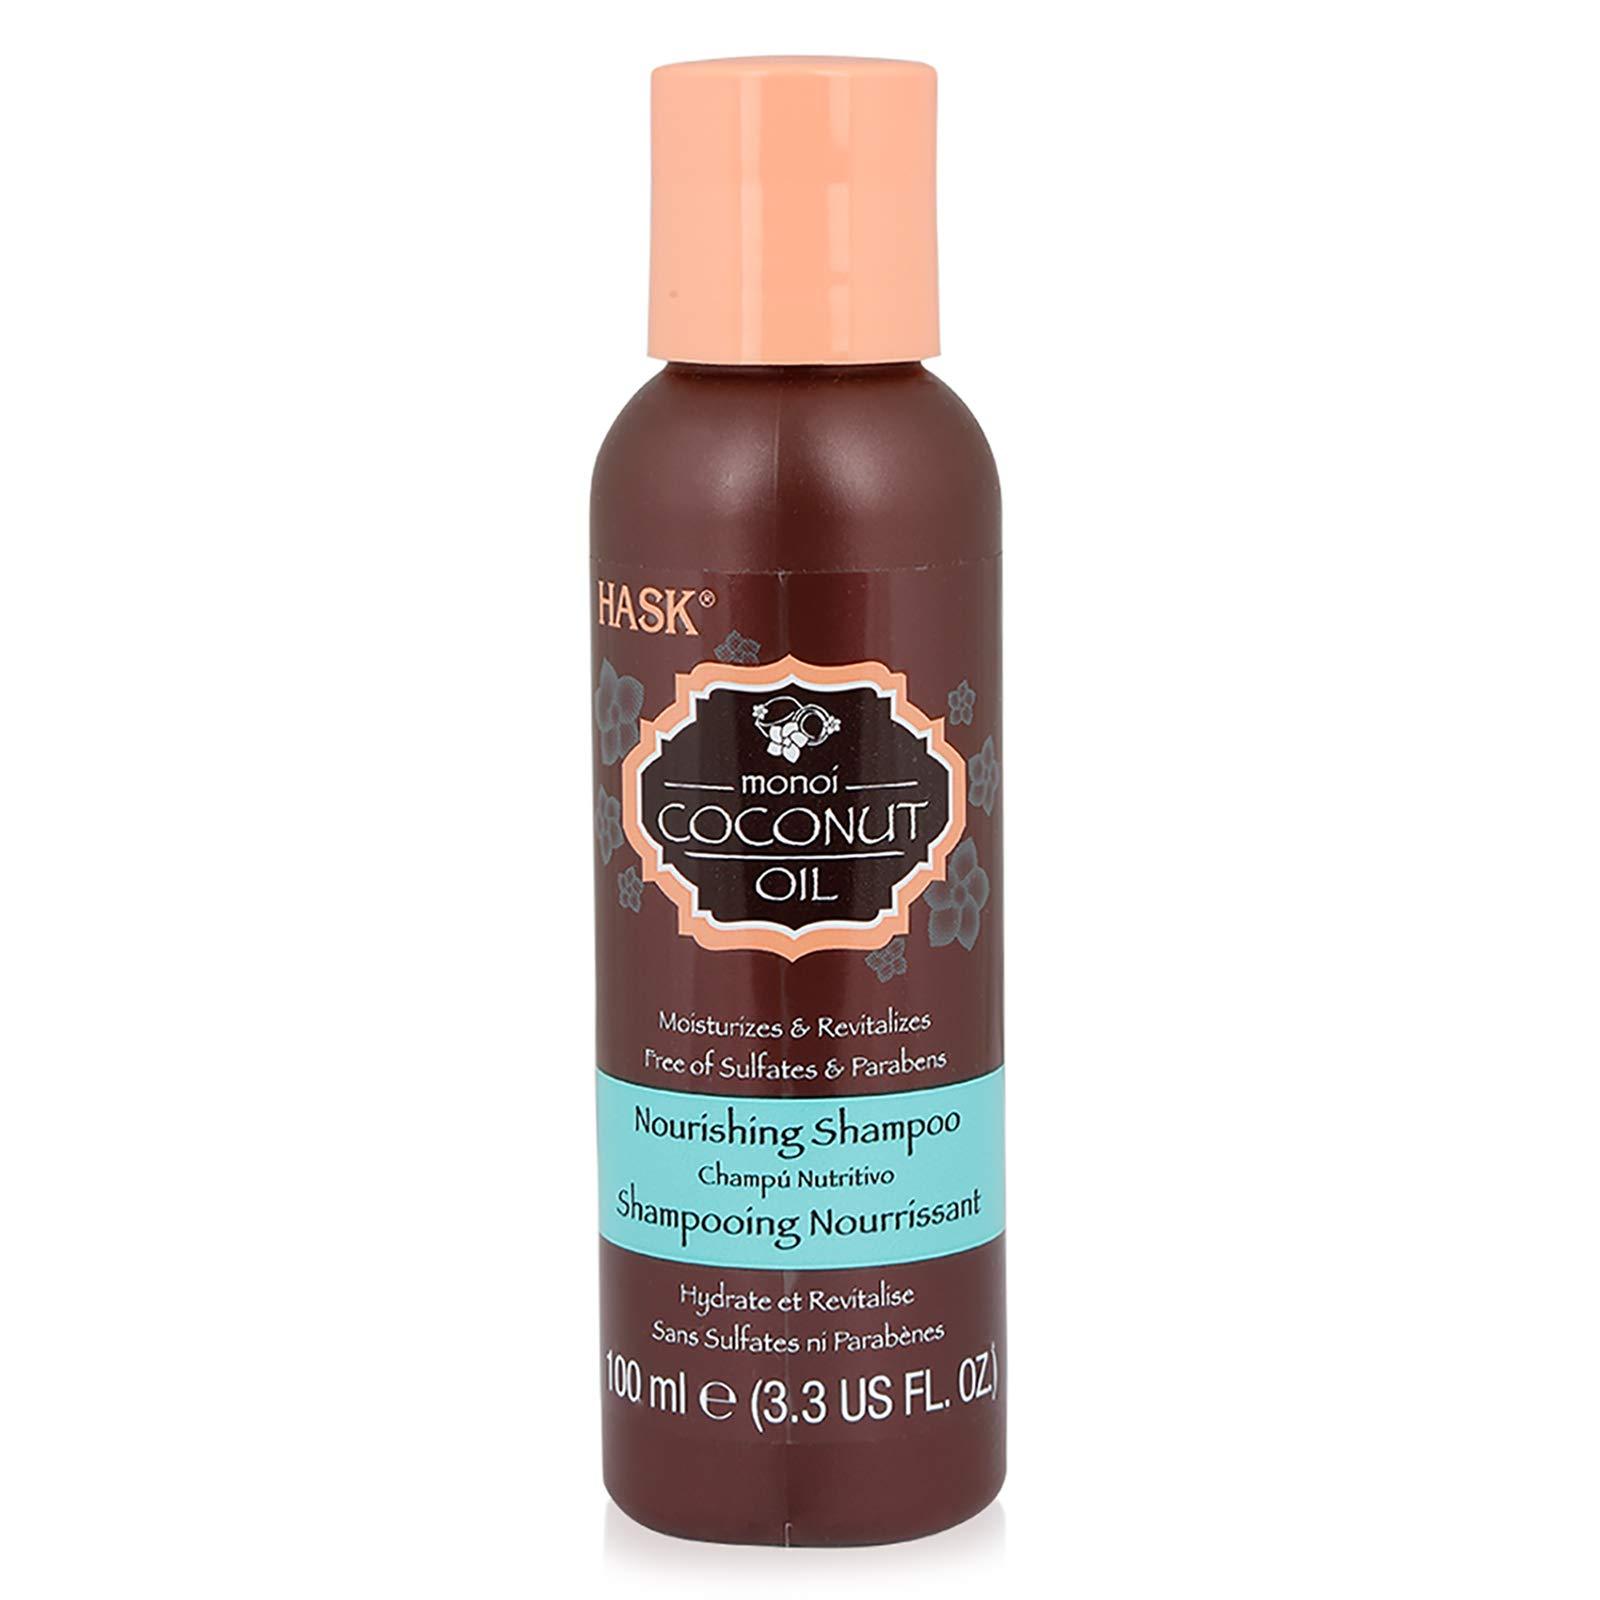 HASK Monoi Coconut Oil Nourishing Shampoo & Conditioner Set 3.3oz